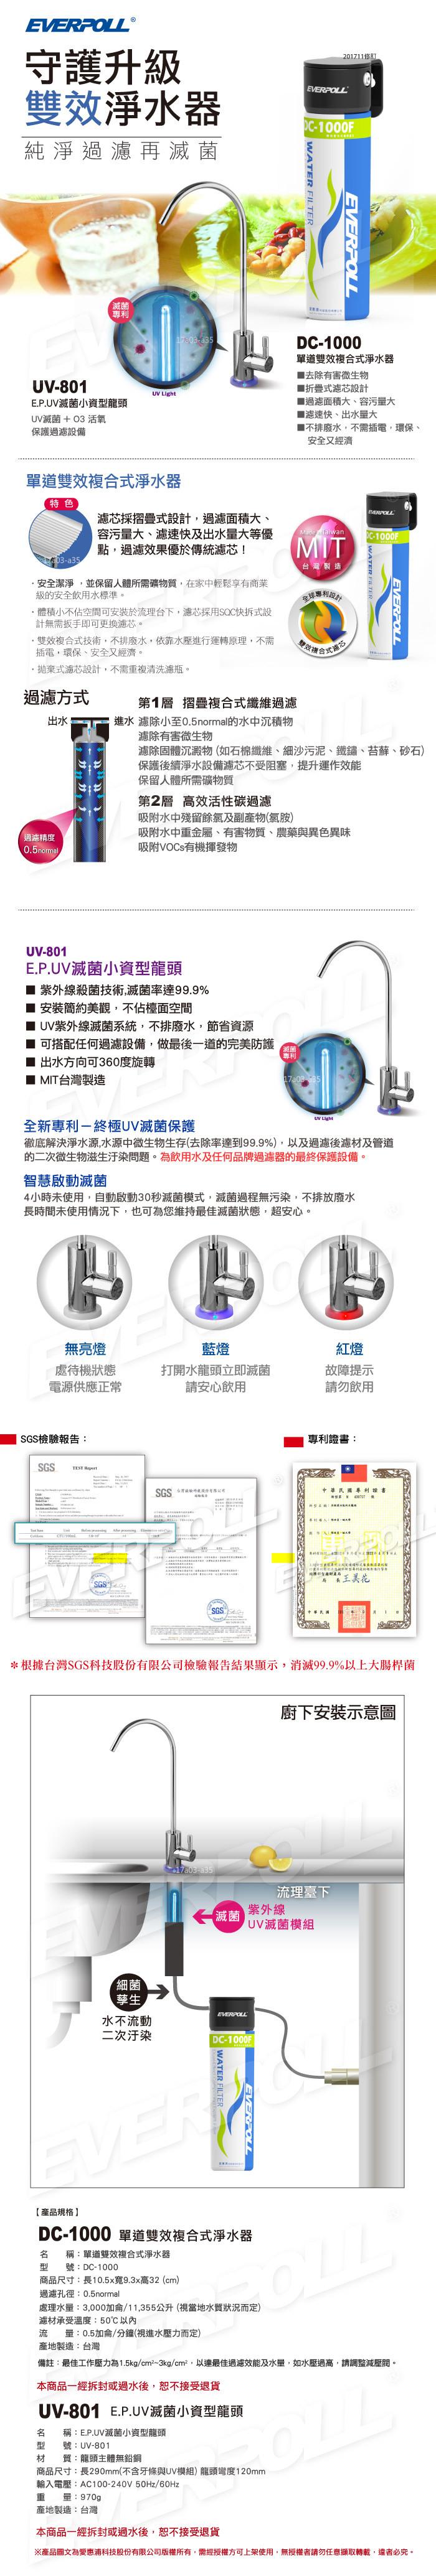 EVERPOLL愛惠浦 UV滅菌龍頭+單道雙效複合式淨水器 UV-801+DC-1000